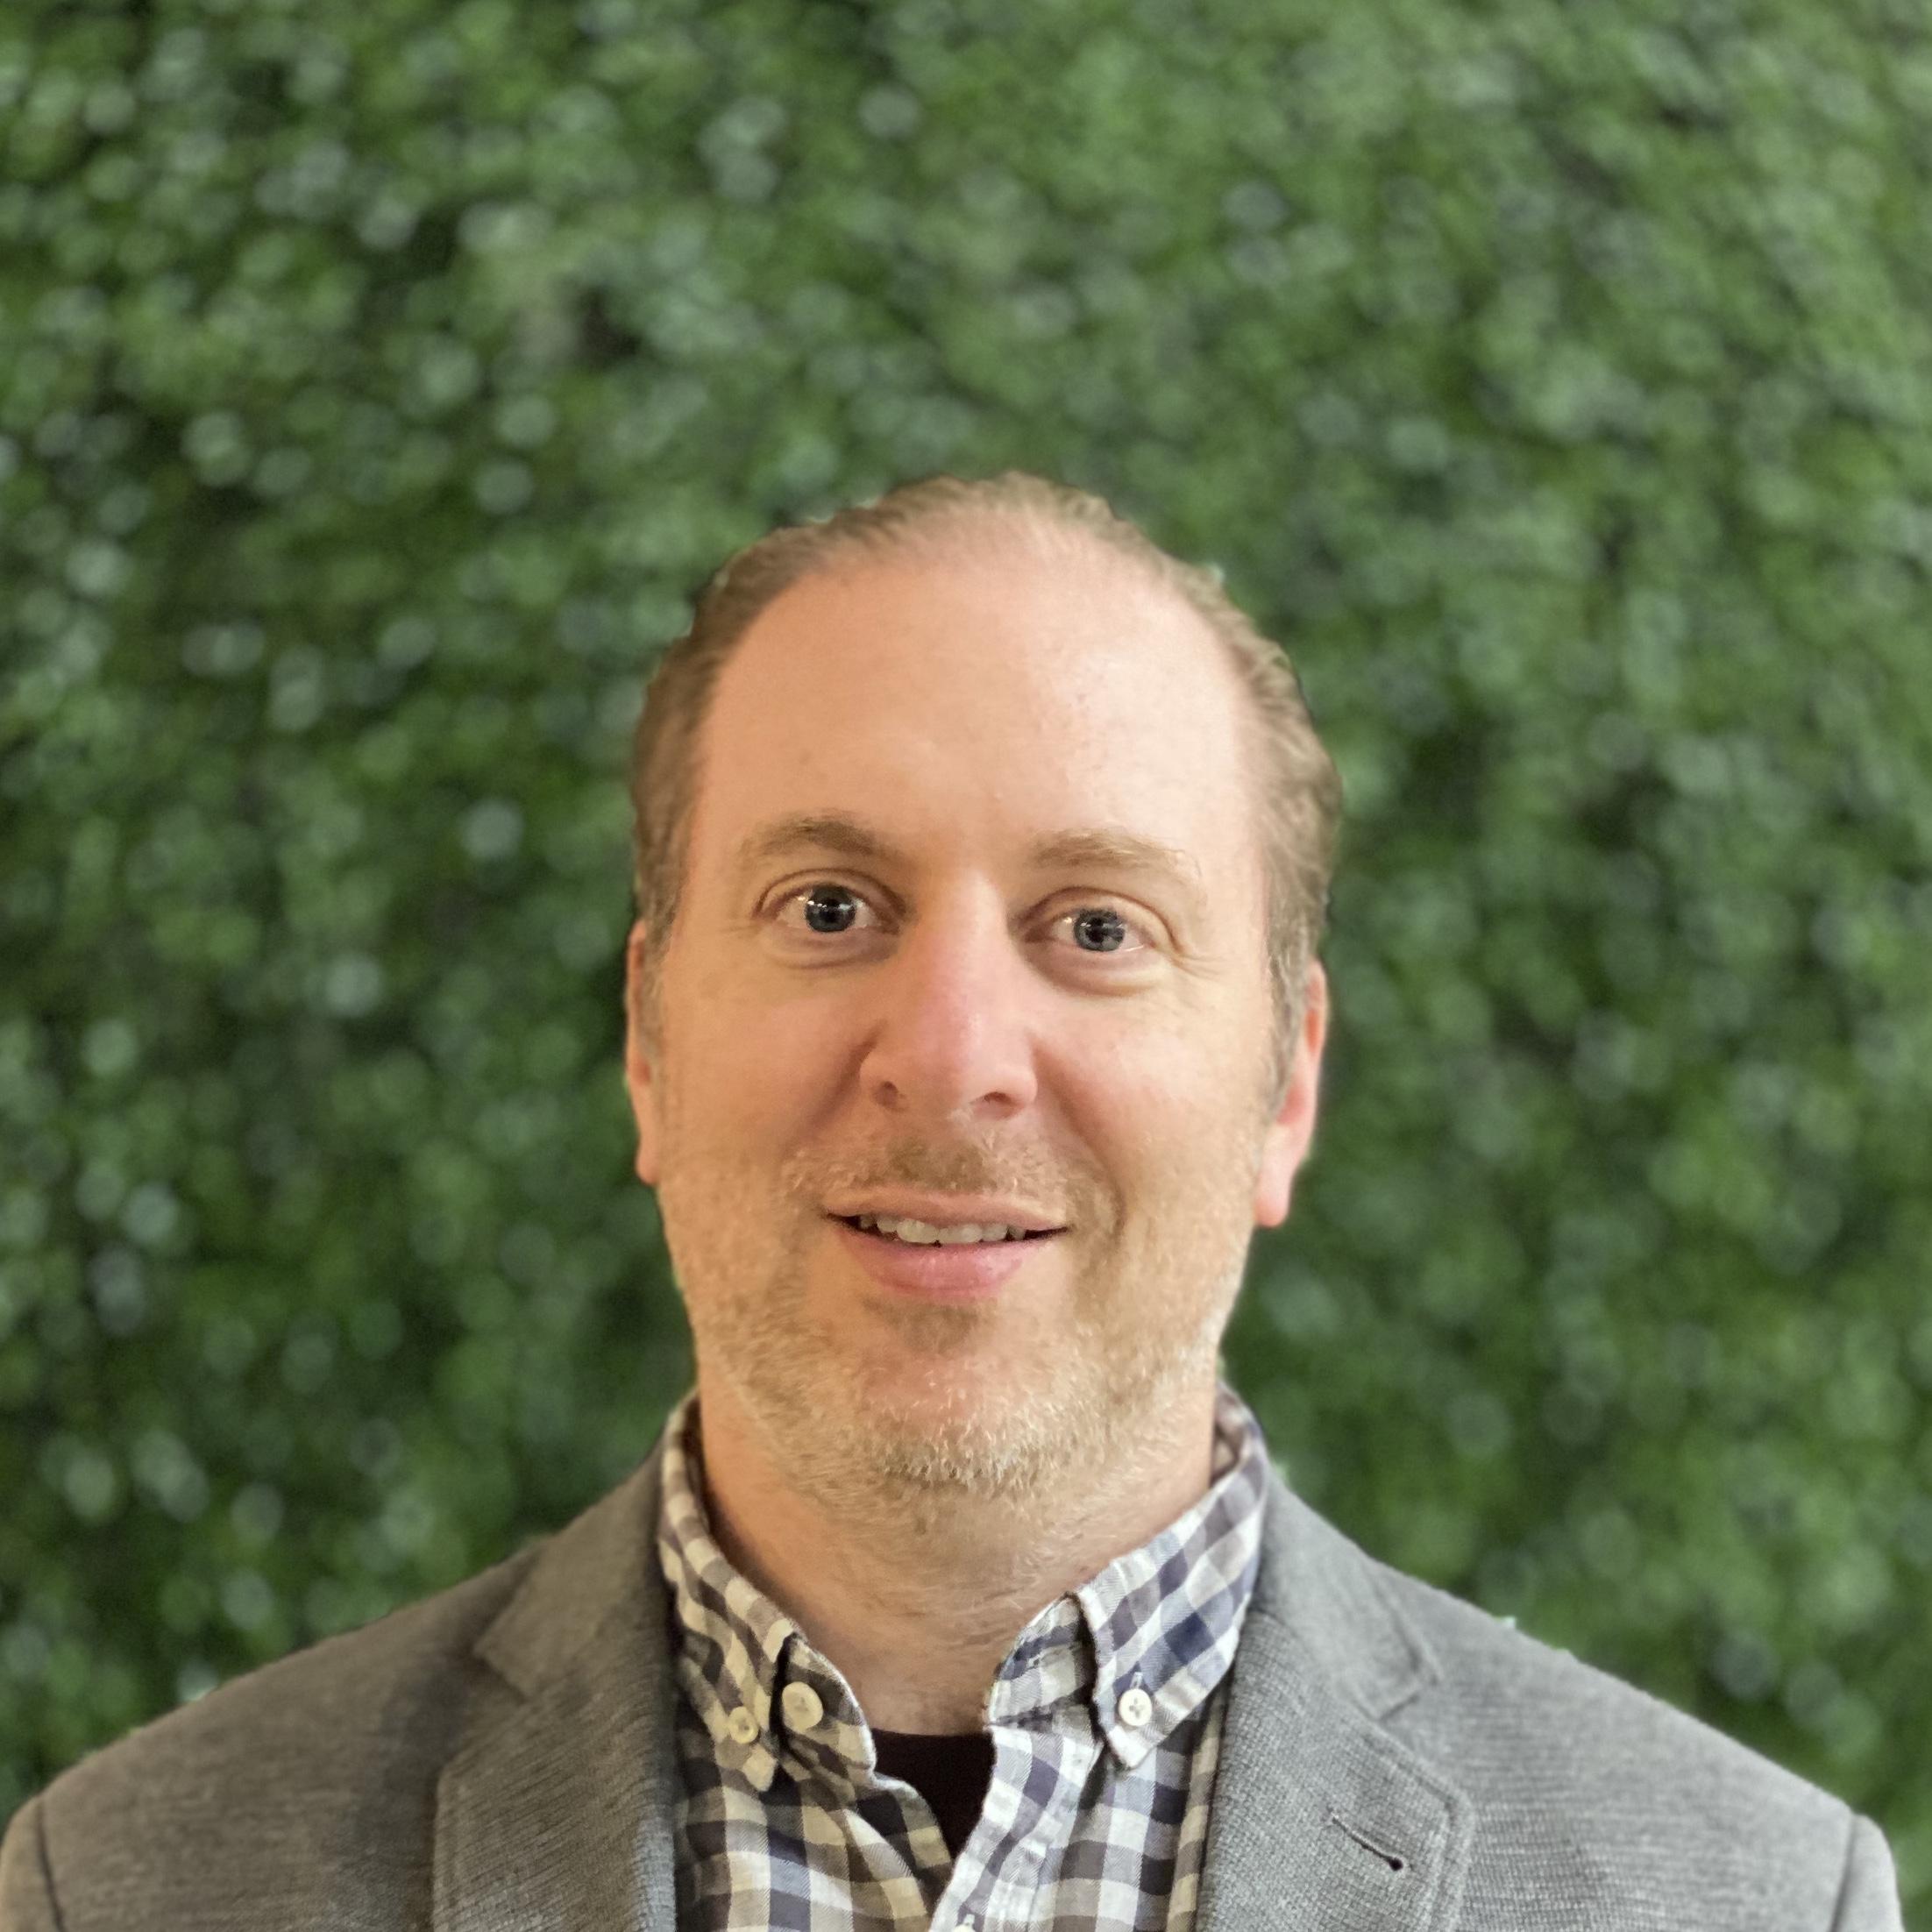 Klutch Co-founder Renato Steinberg